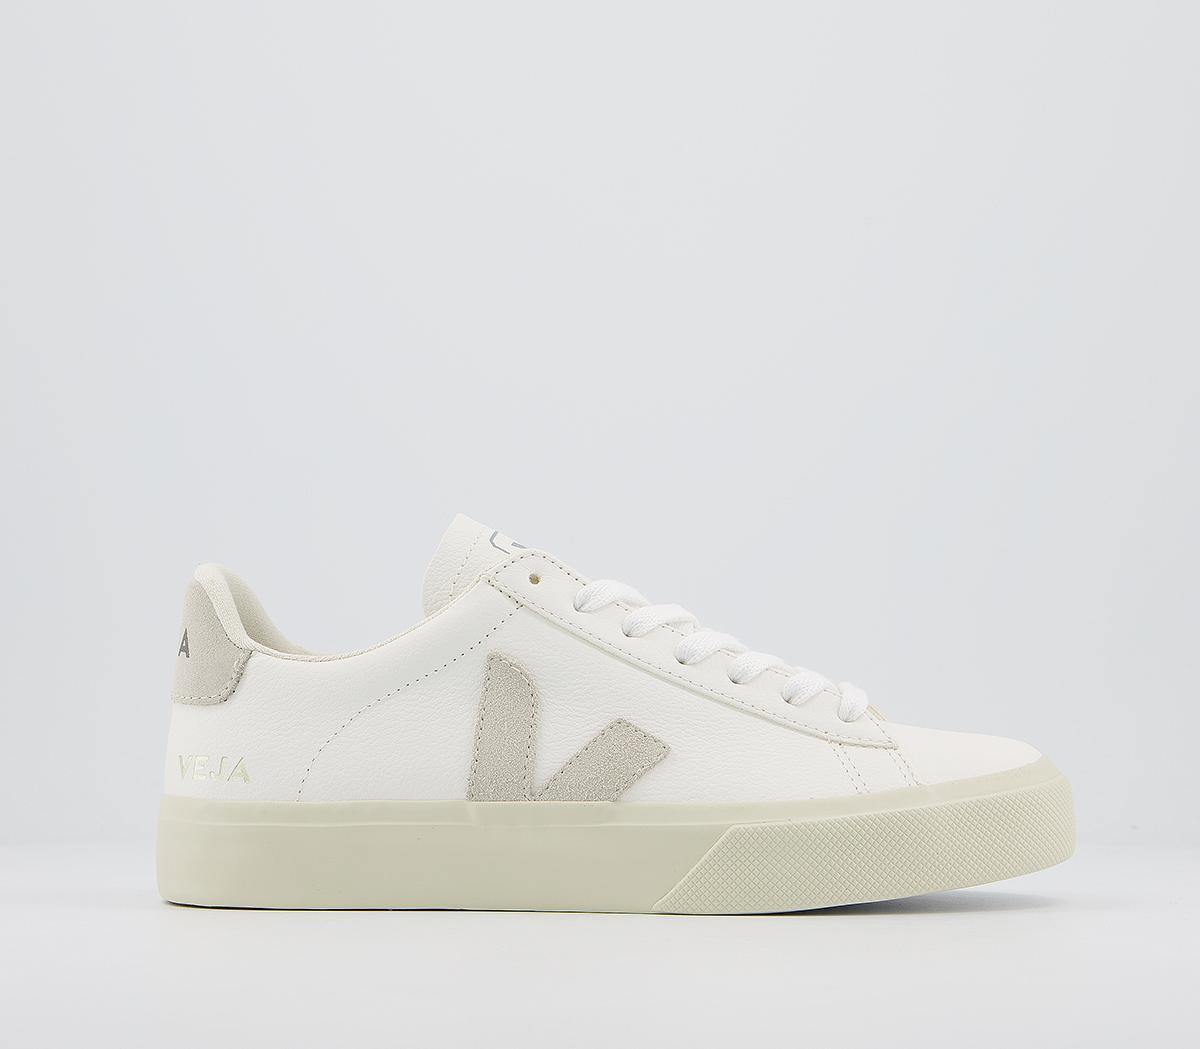 abogado Microbio sencillo  Veja Campo Trainers White Natural Leather F - Hers trainers